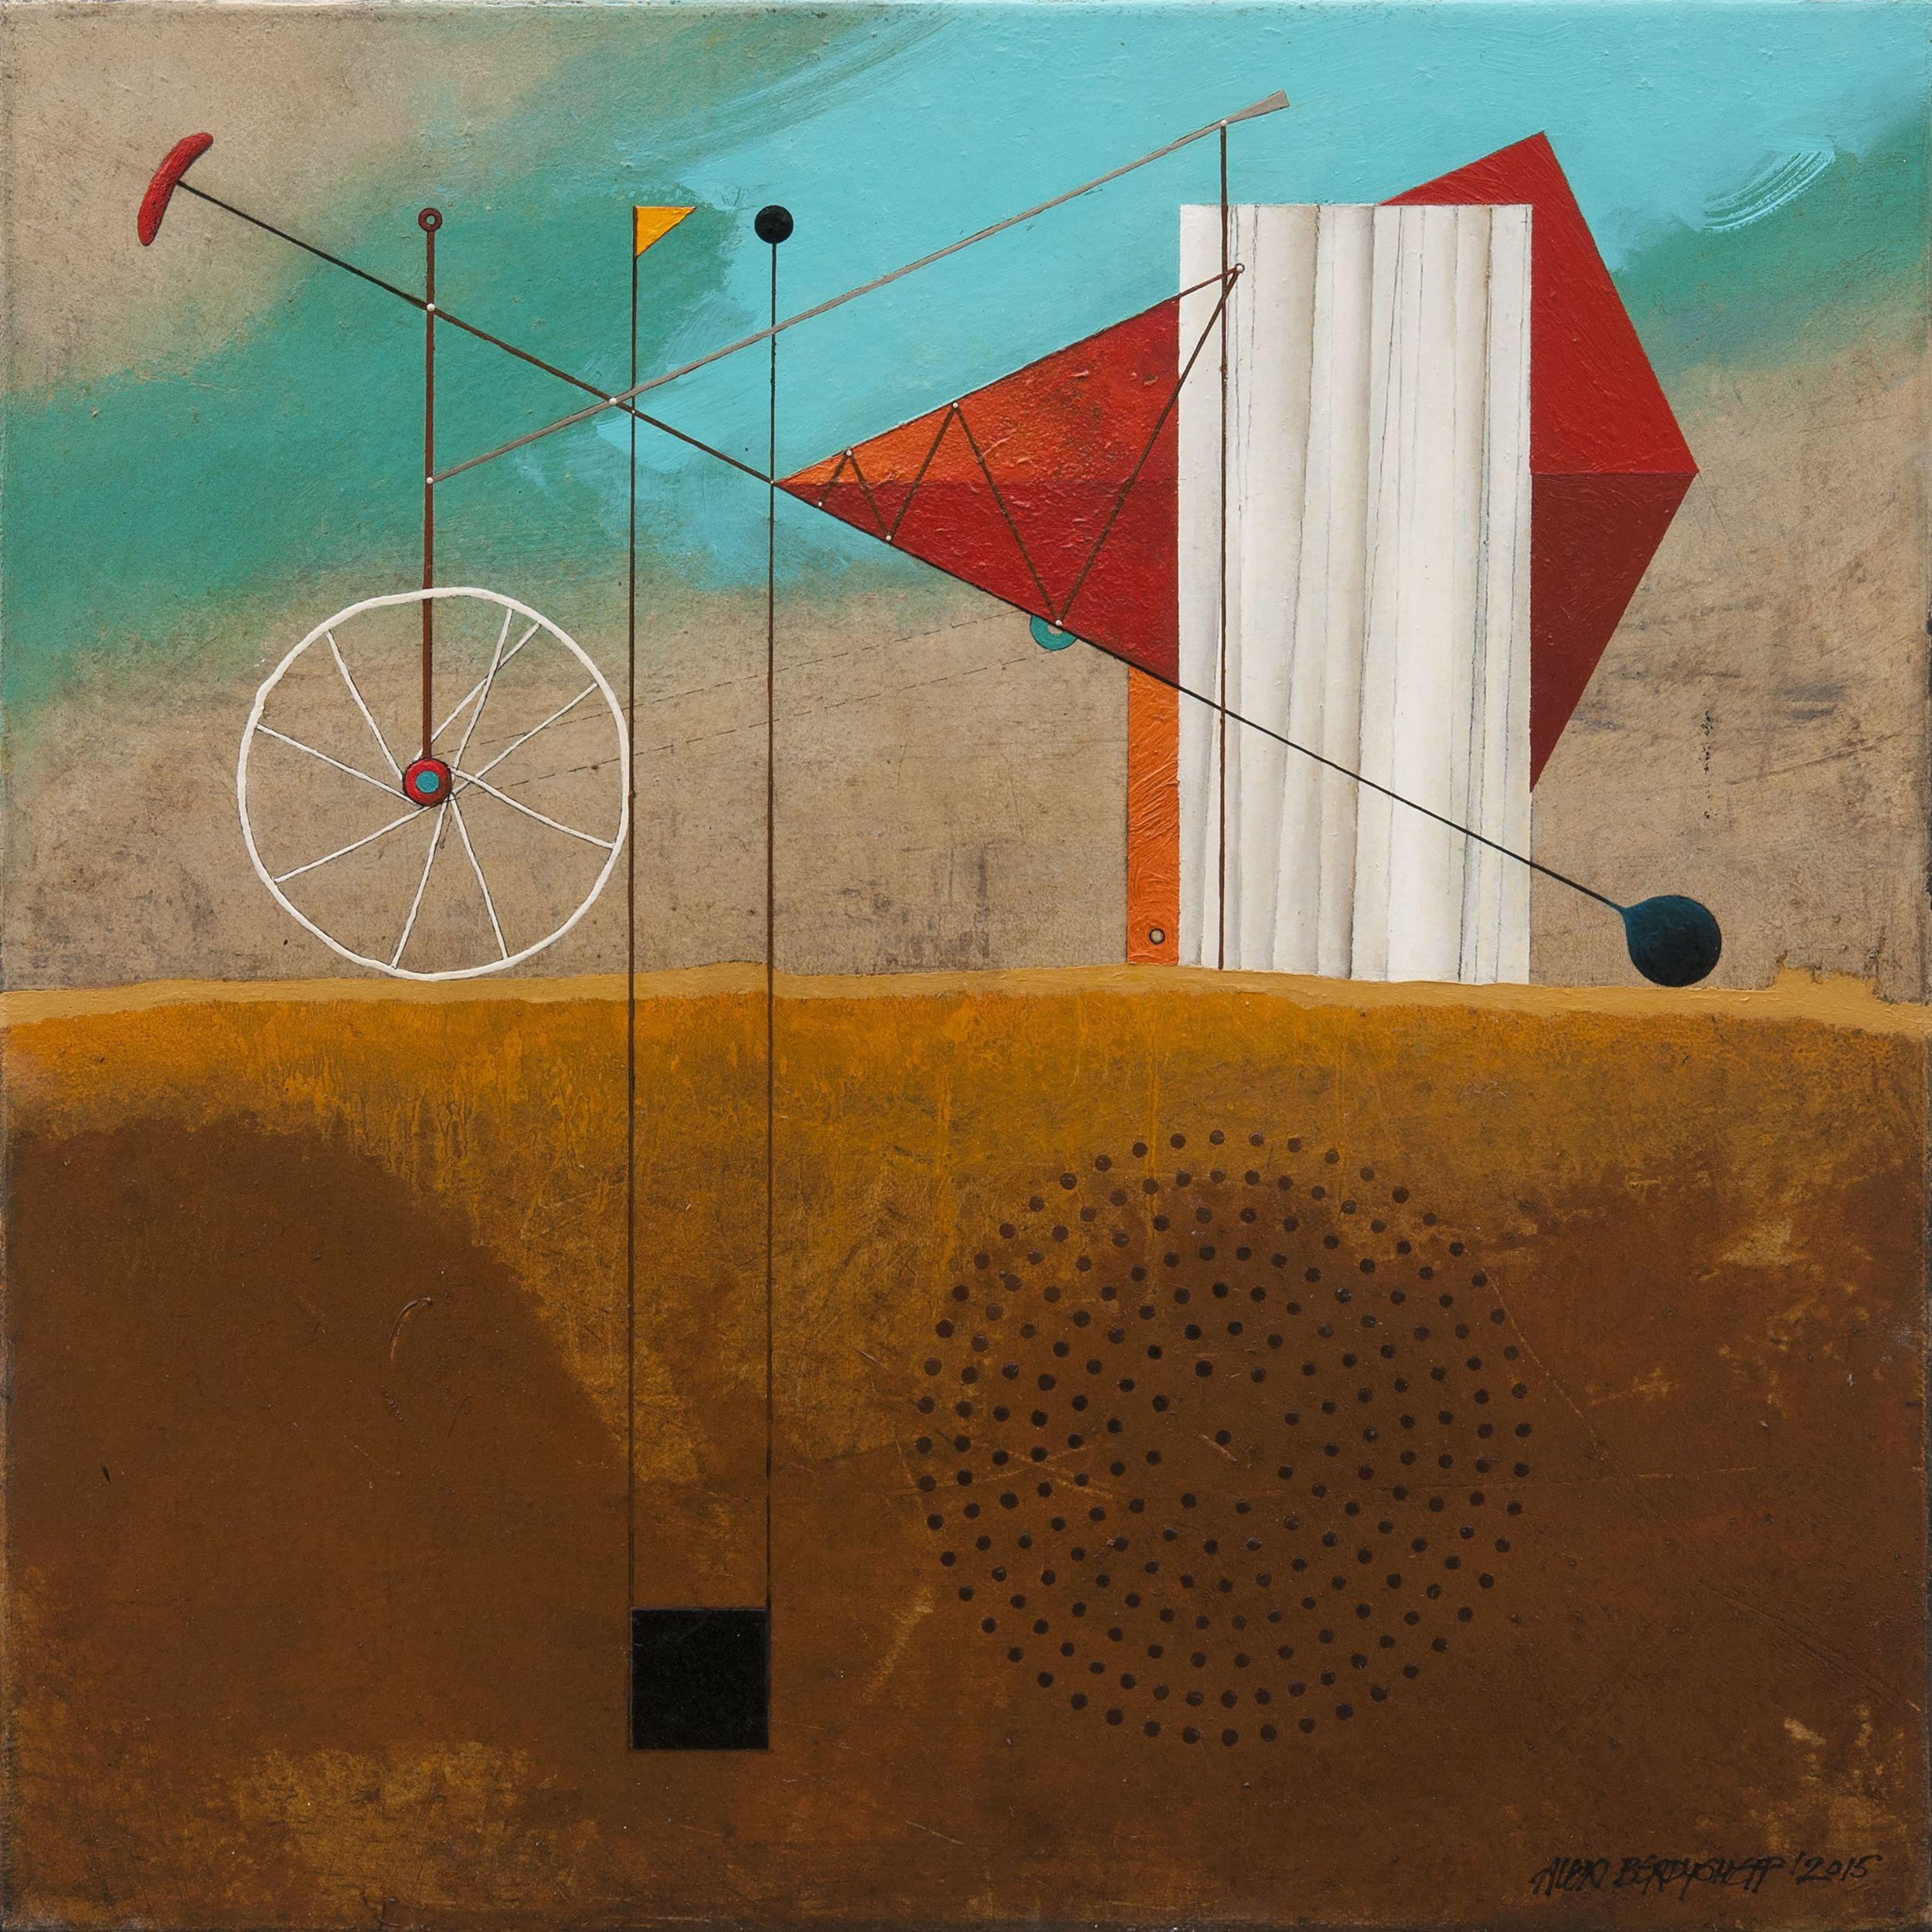 Construction, Oil on canvas, 46x46 cm, 2015